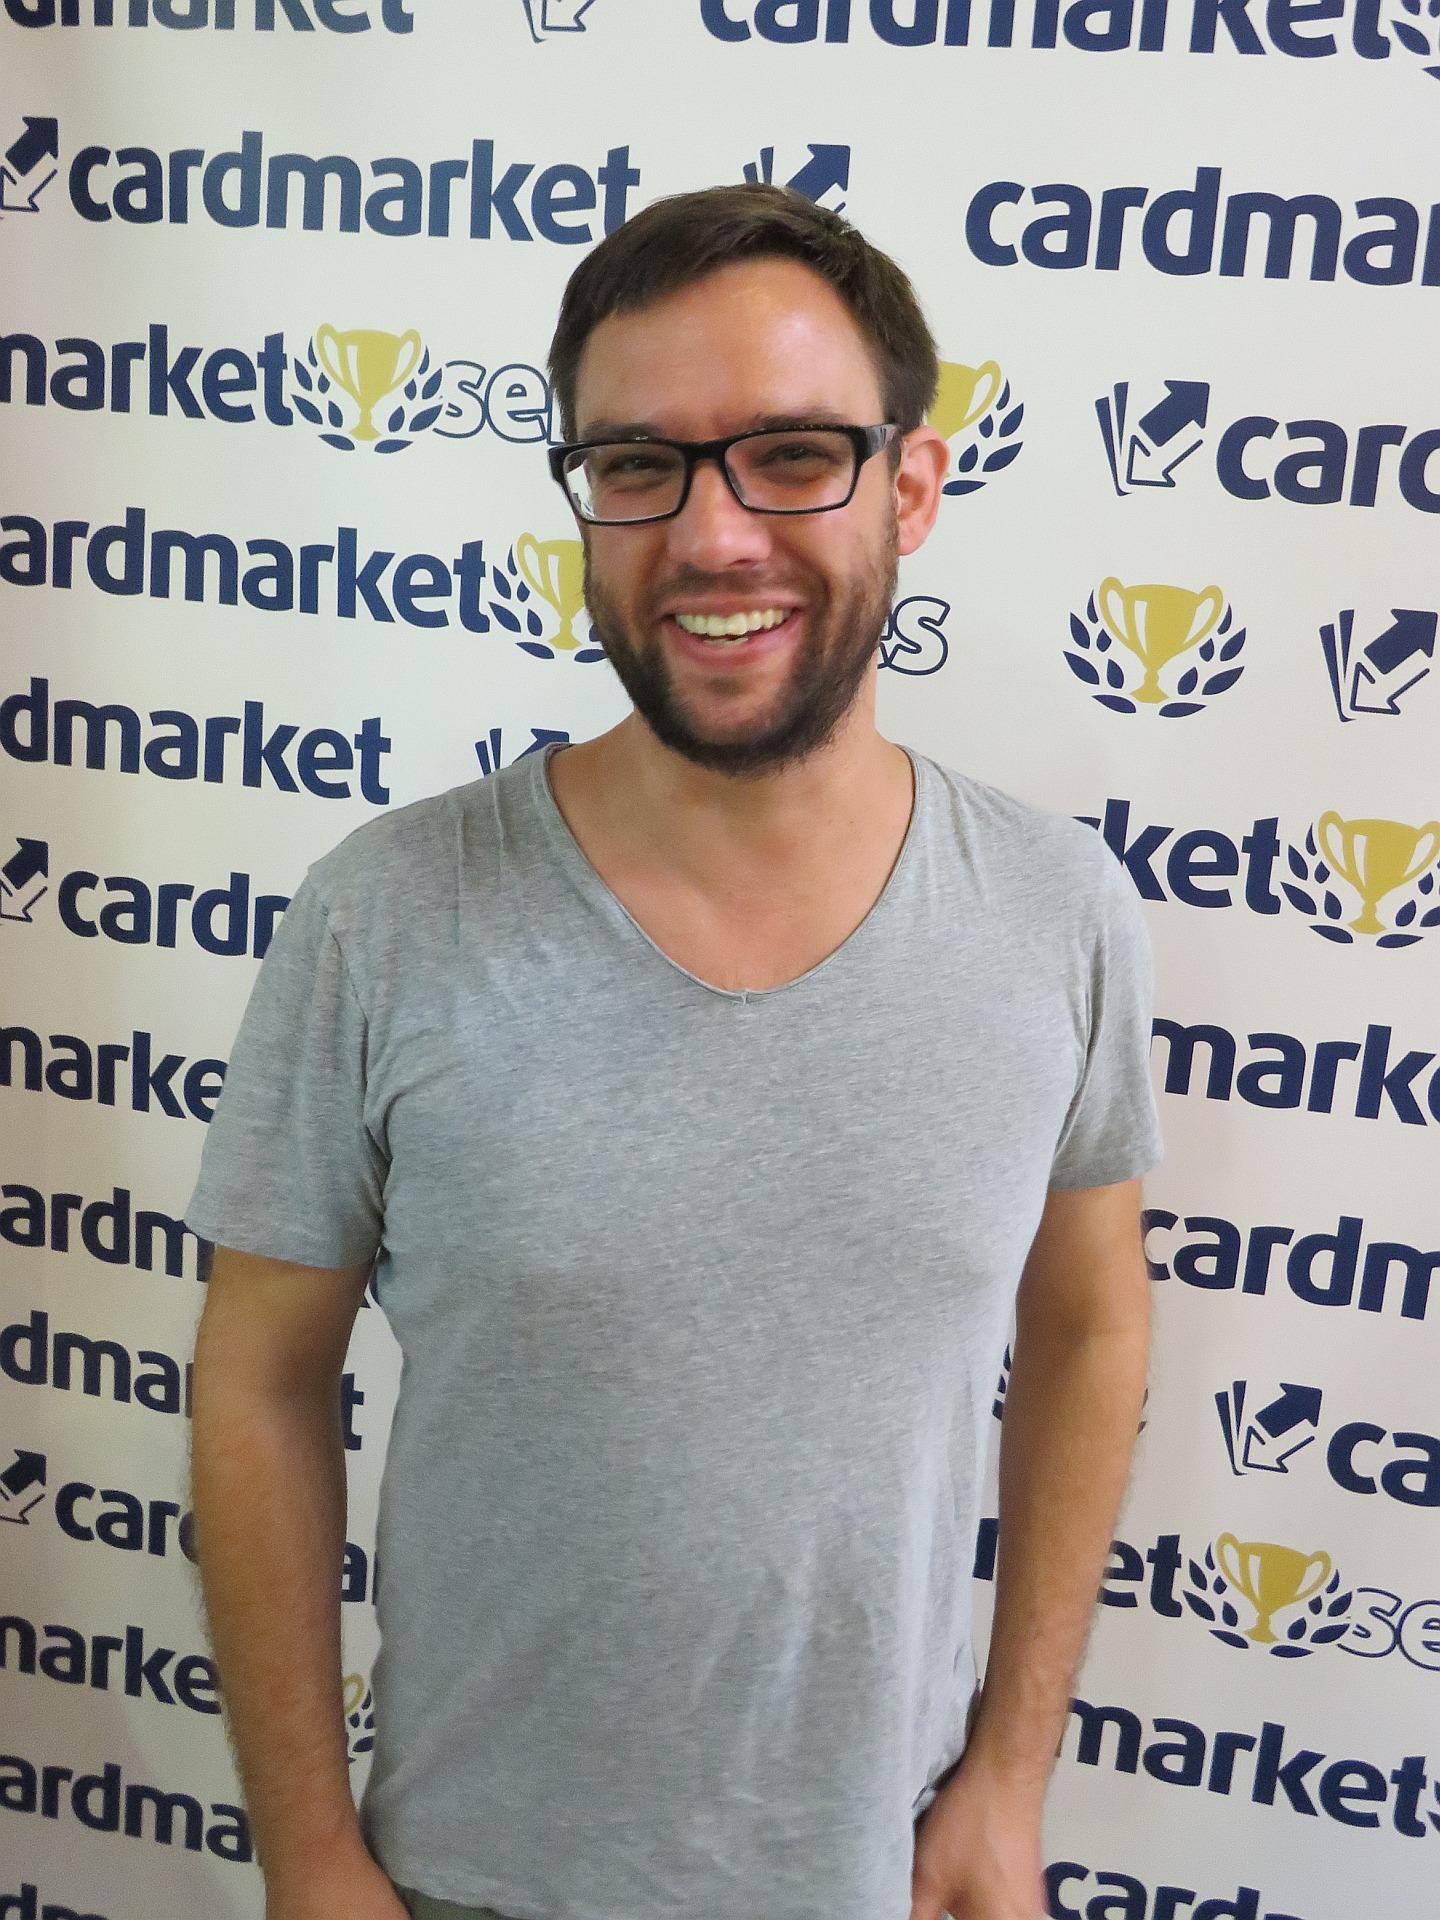 Martin Trossbach